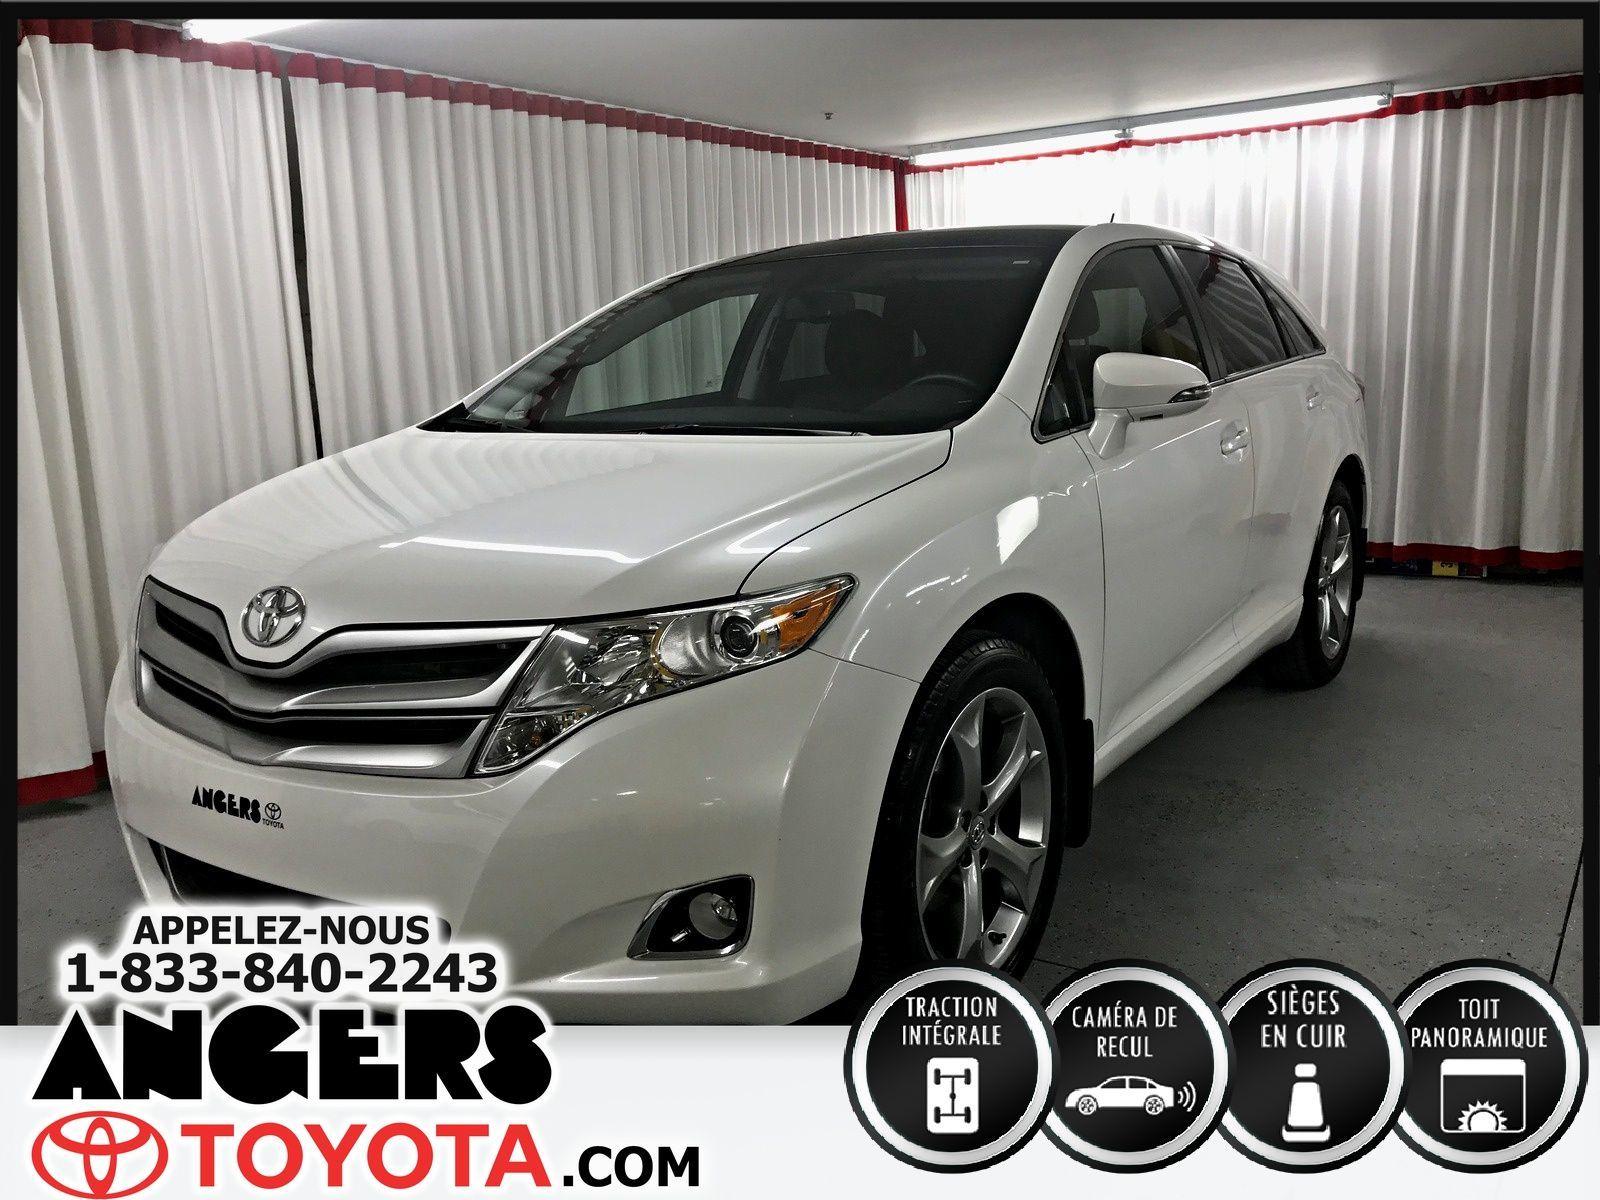 Toyota Venza 2016 >> 2016 Toyota Venza Xle